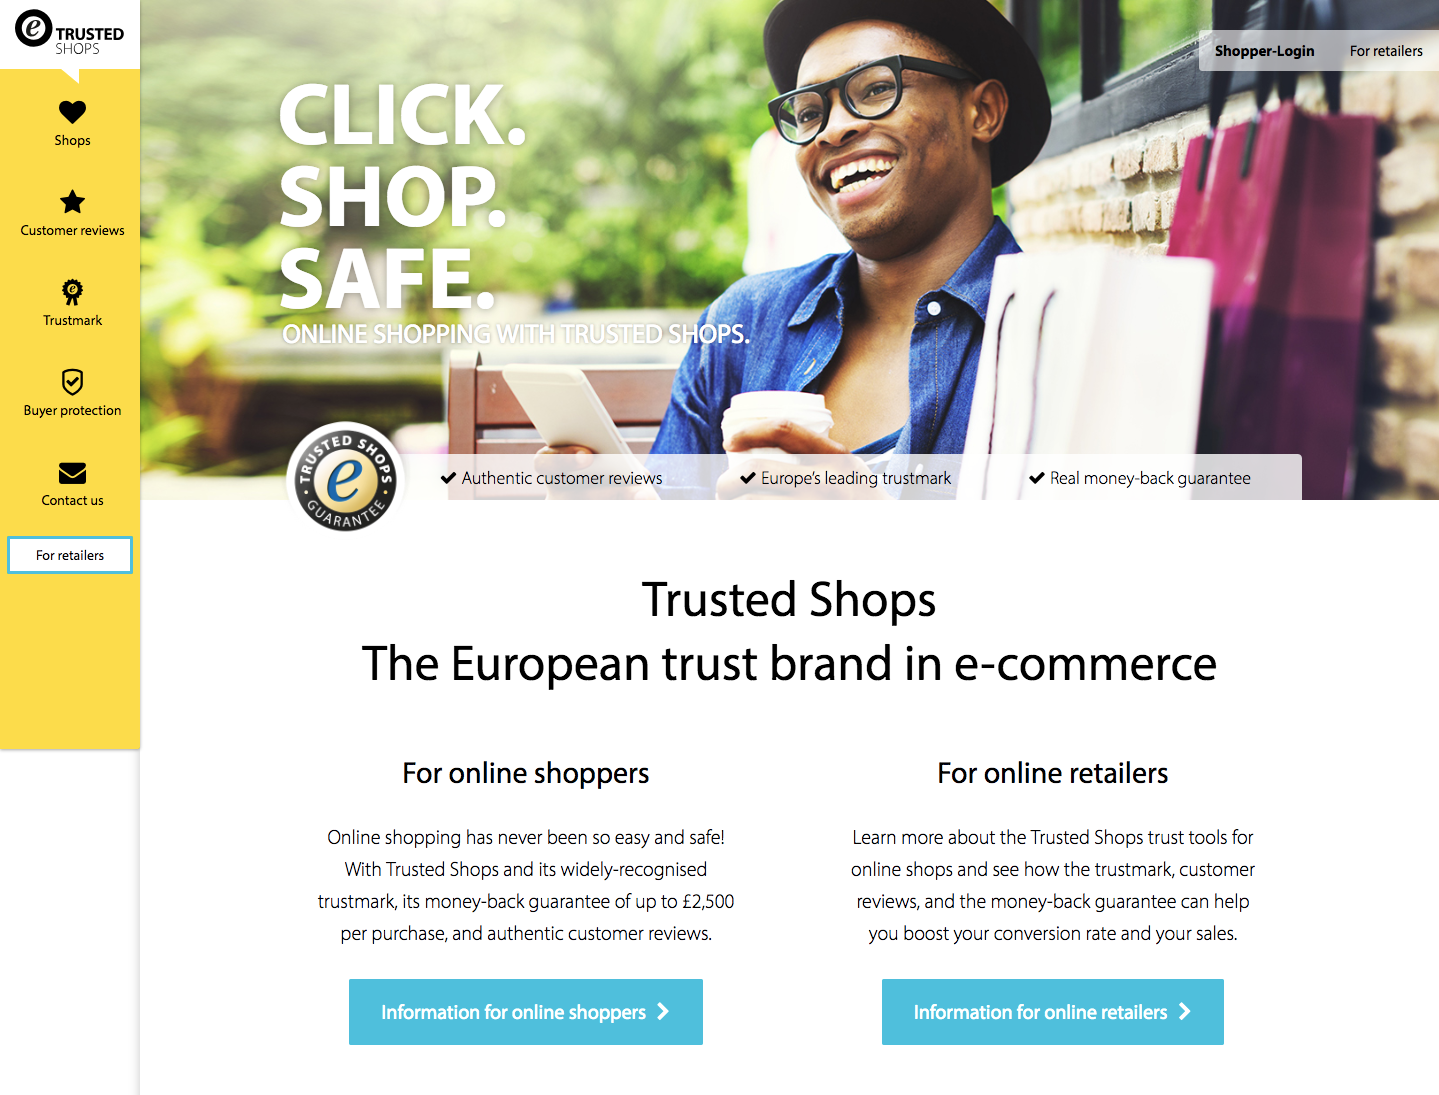 6-trustedShop